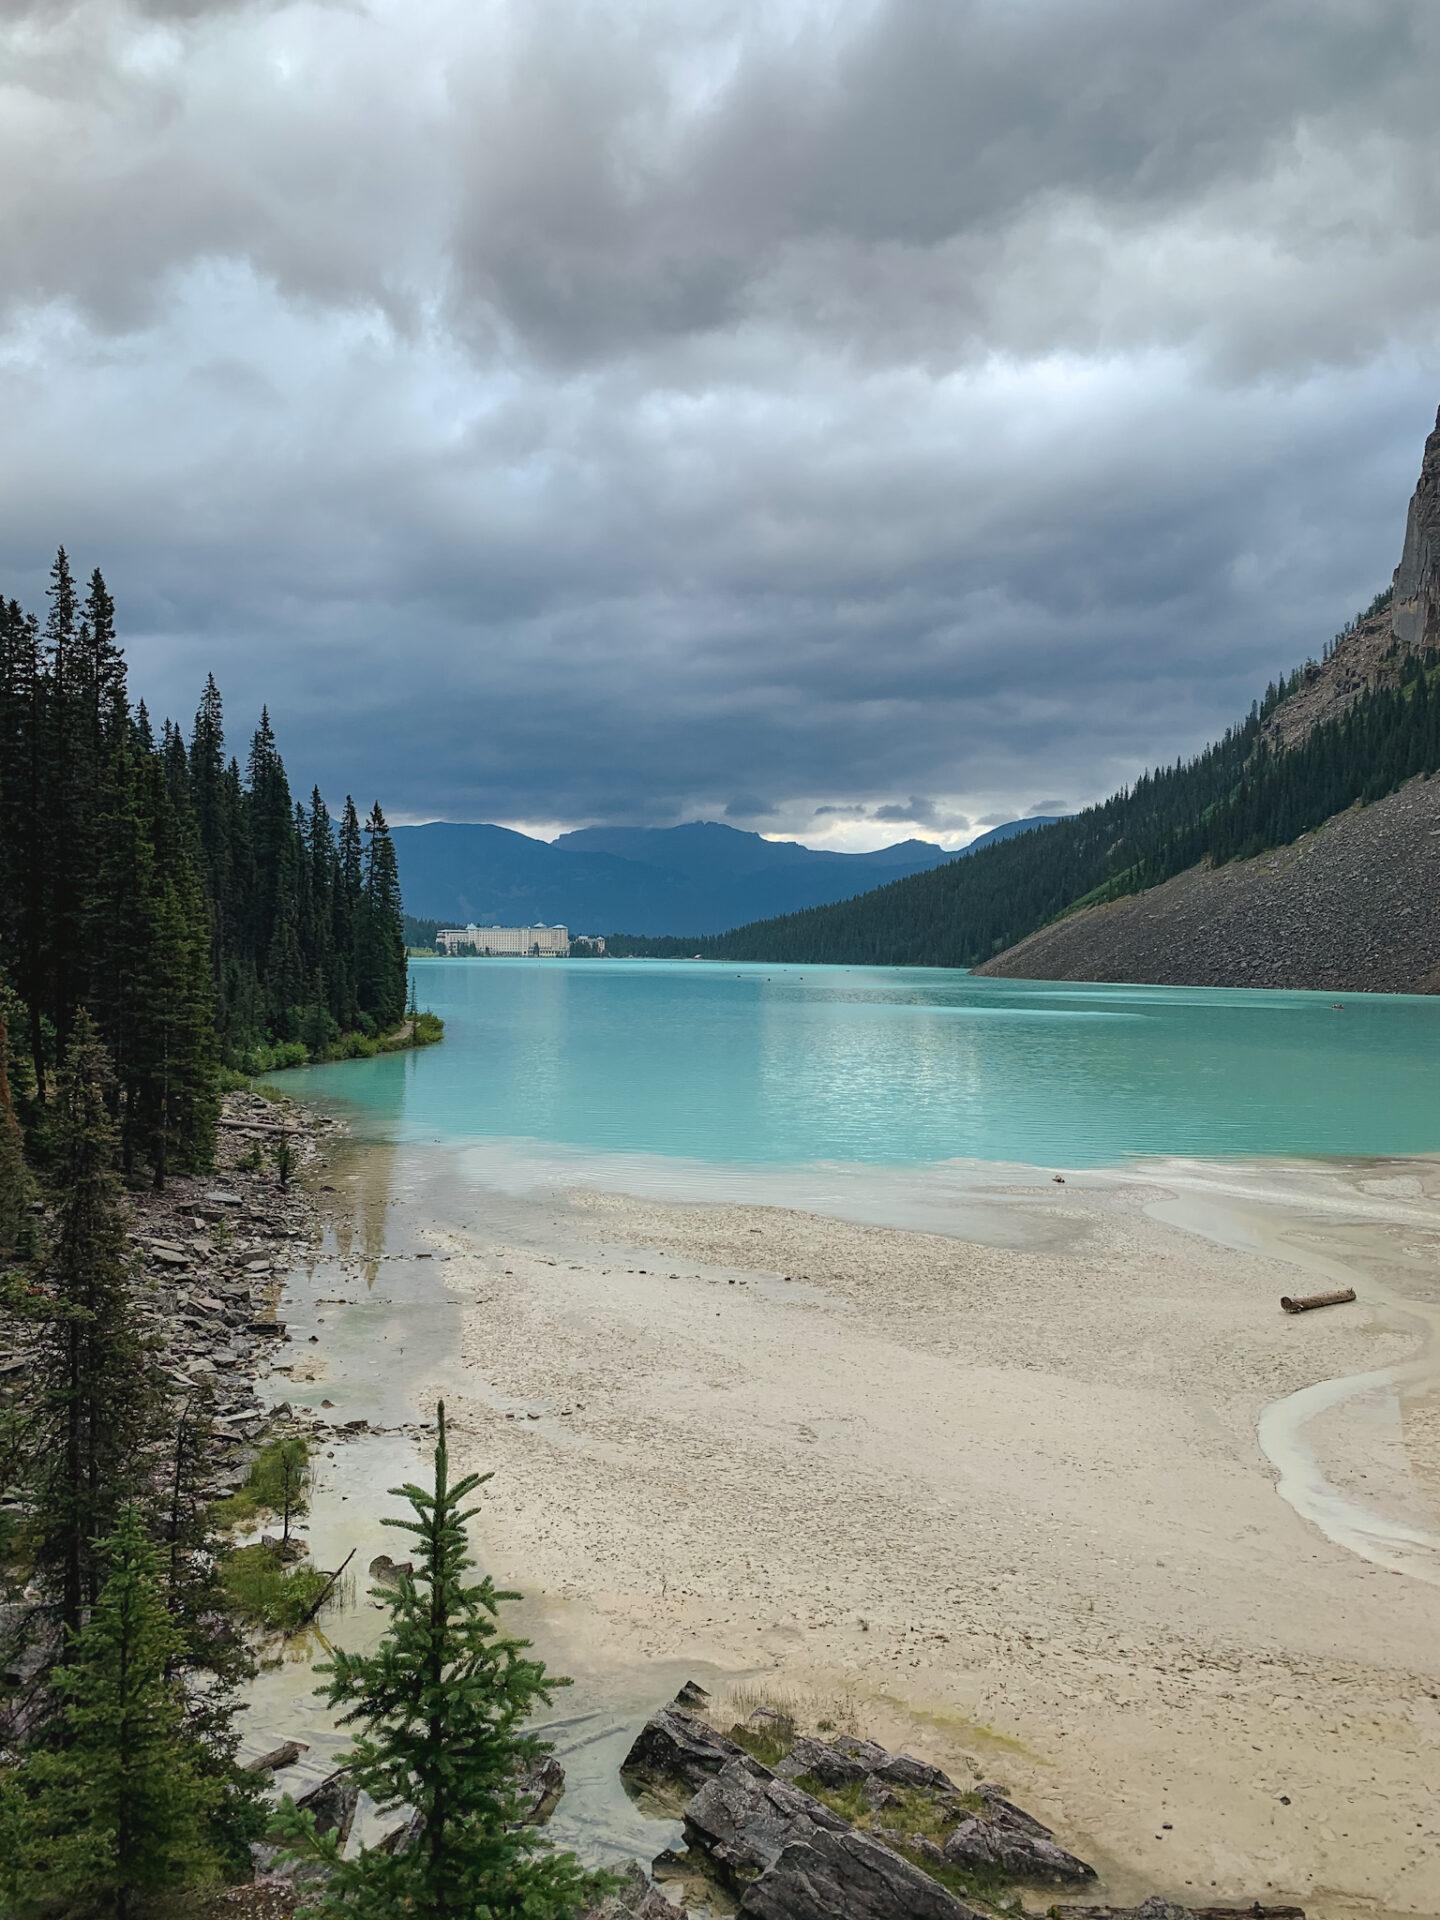 Plain of the Six Glaciers hiking trail in Lake Louise, Alberta